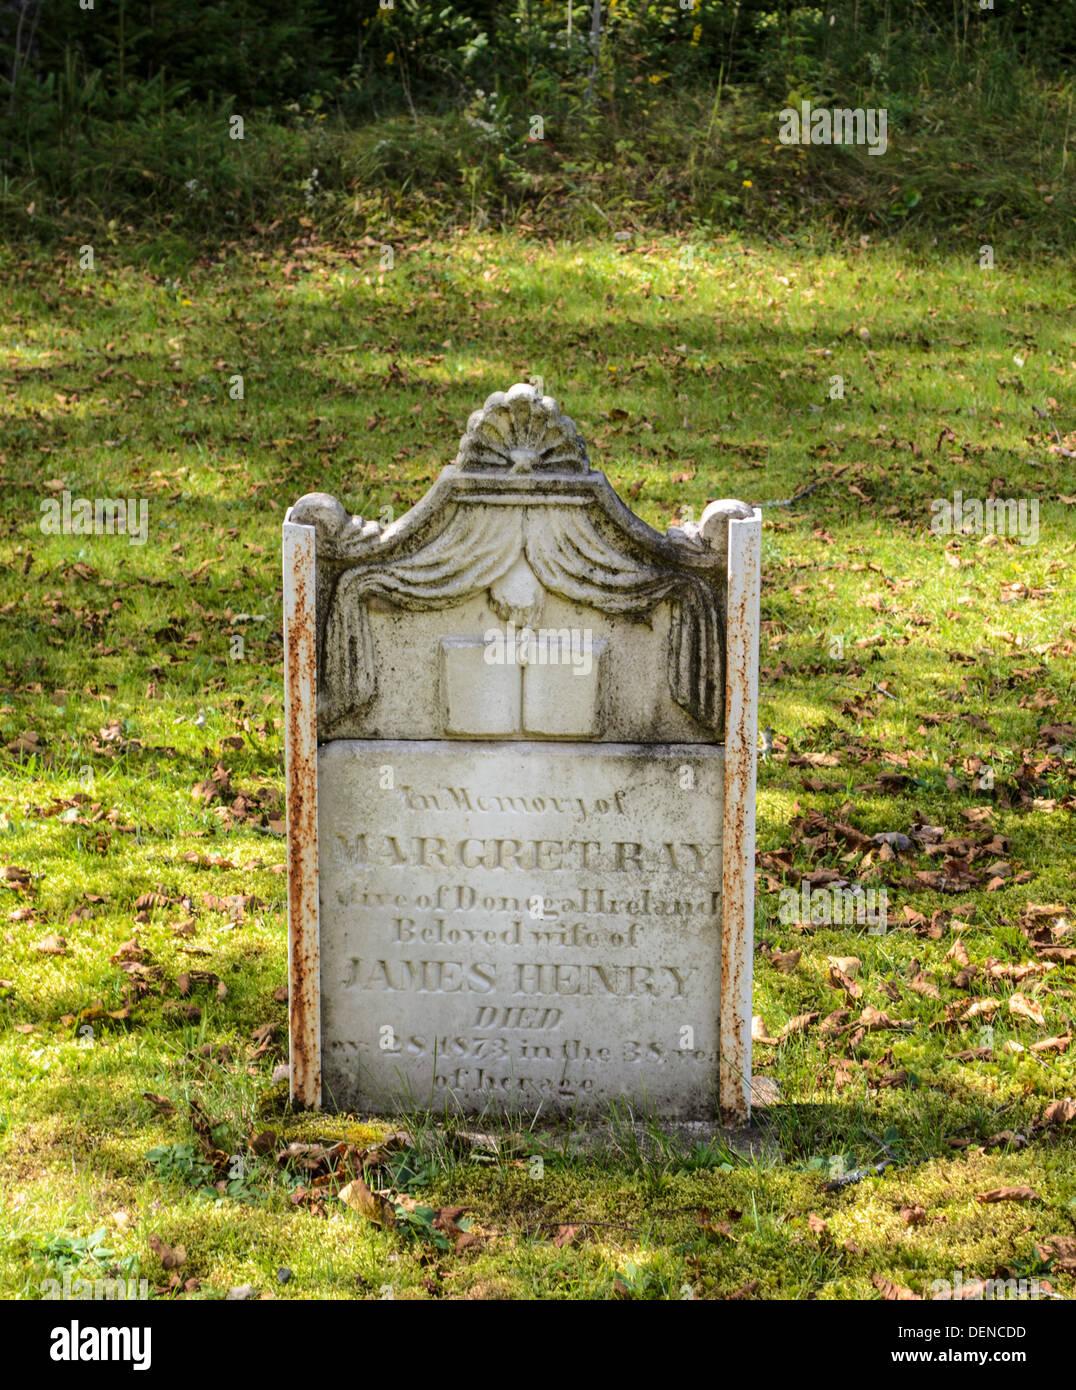 Loyalist gravestones in New Brunswick Canada graveyard - Stock Image